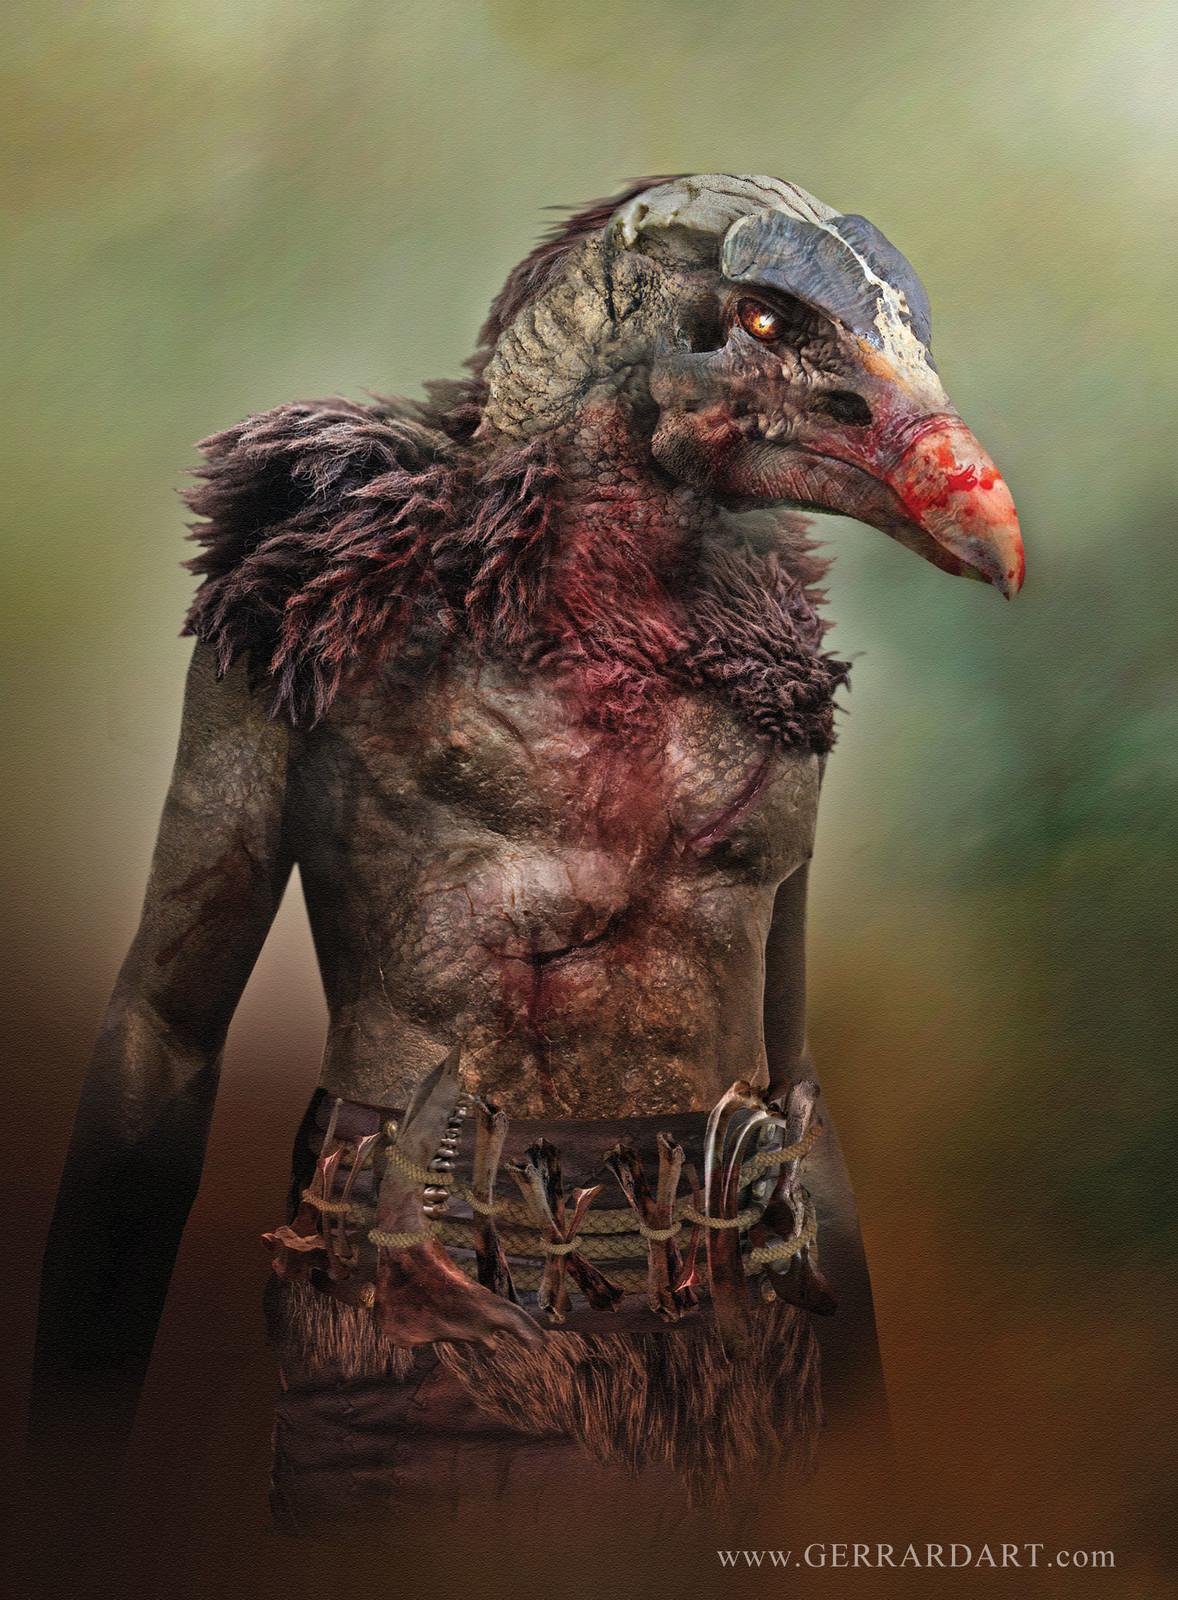 Vulturman From Art of Gerrard vol2 RIVALS.   https://gerrardian.bigcartel.com/